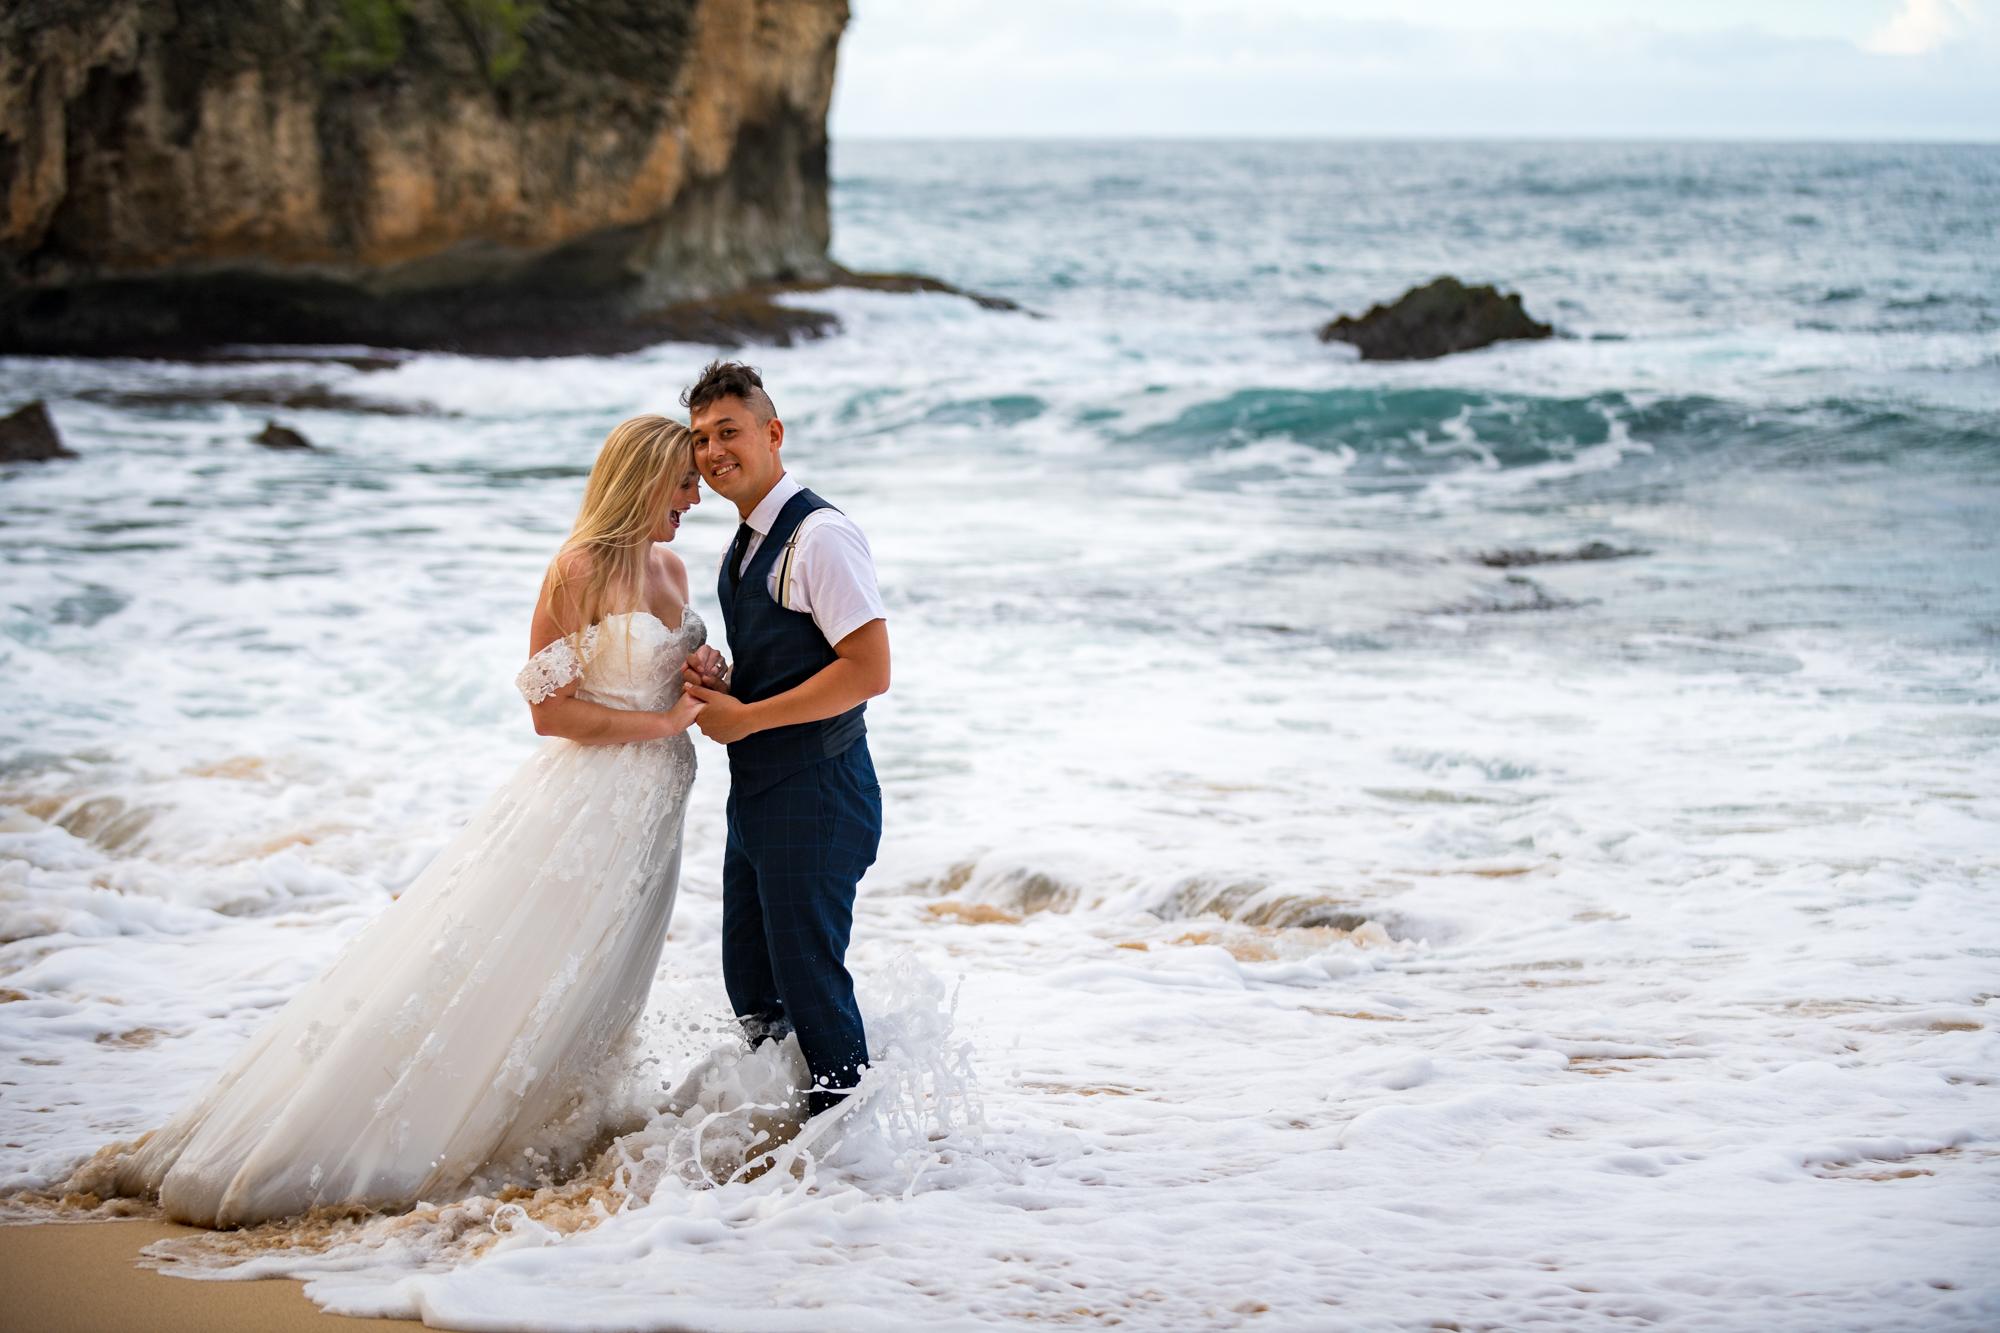 sunrise-wedding-coleen-shipwrecks-6-29-2919-9940.jpg